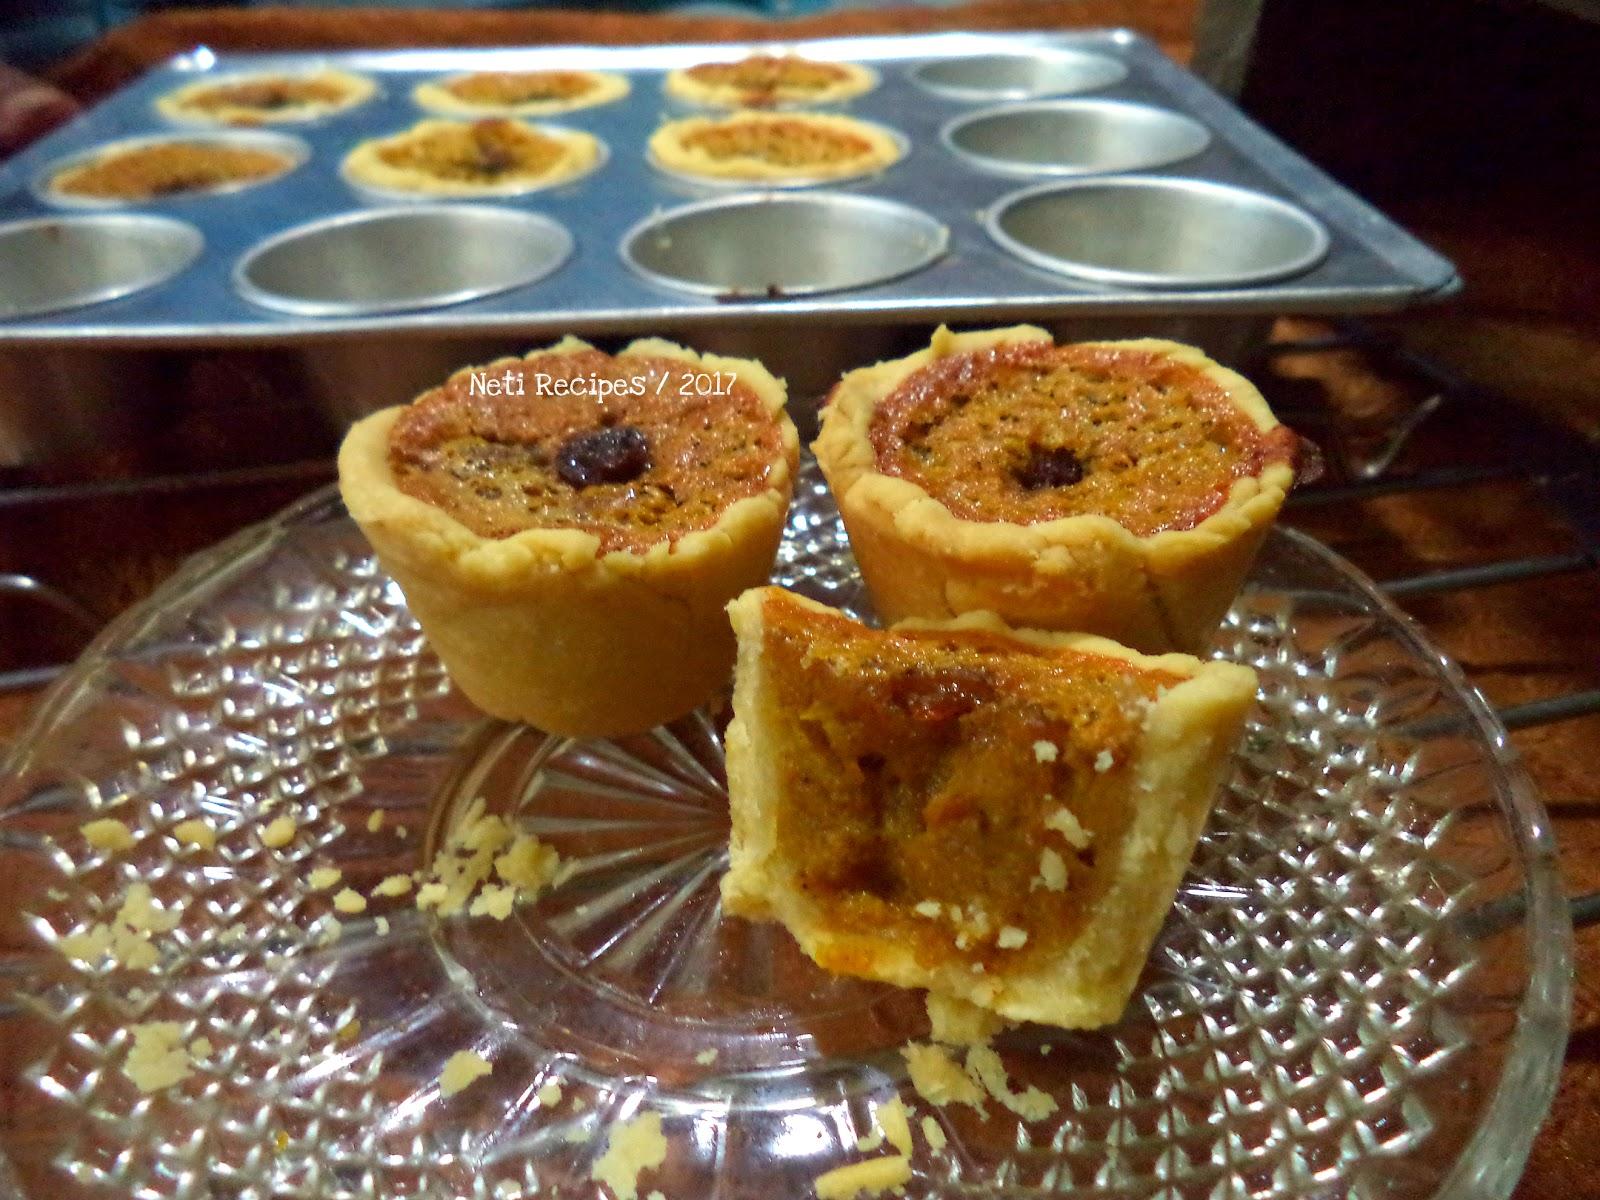 Resep Pie Labu Kuning Dengan Kismis Resep Neti